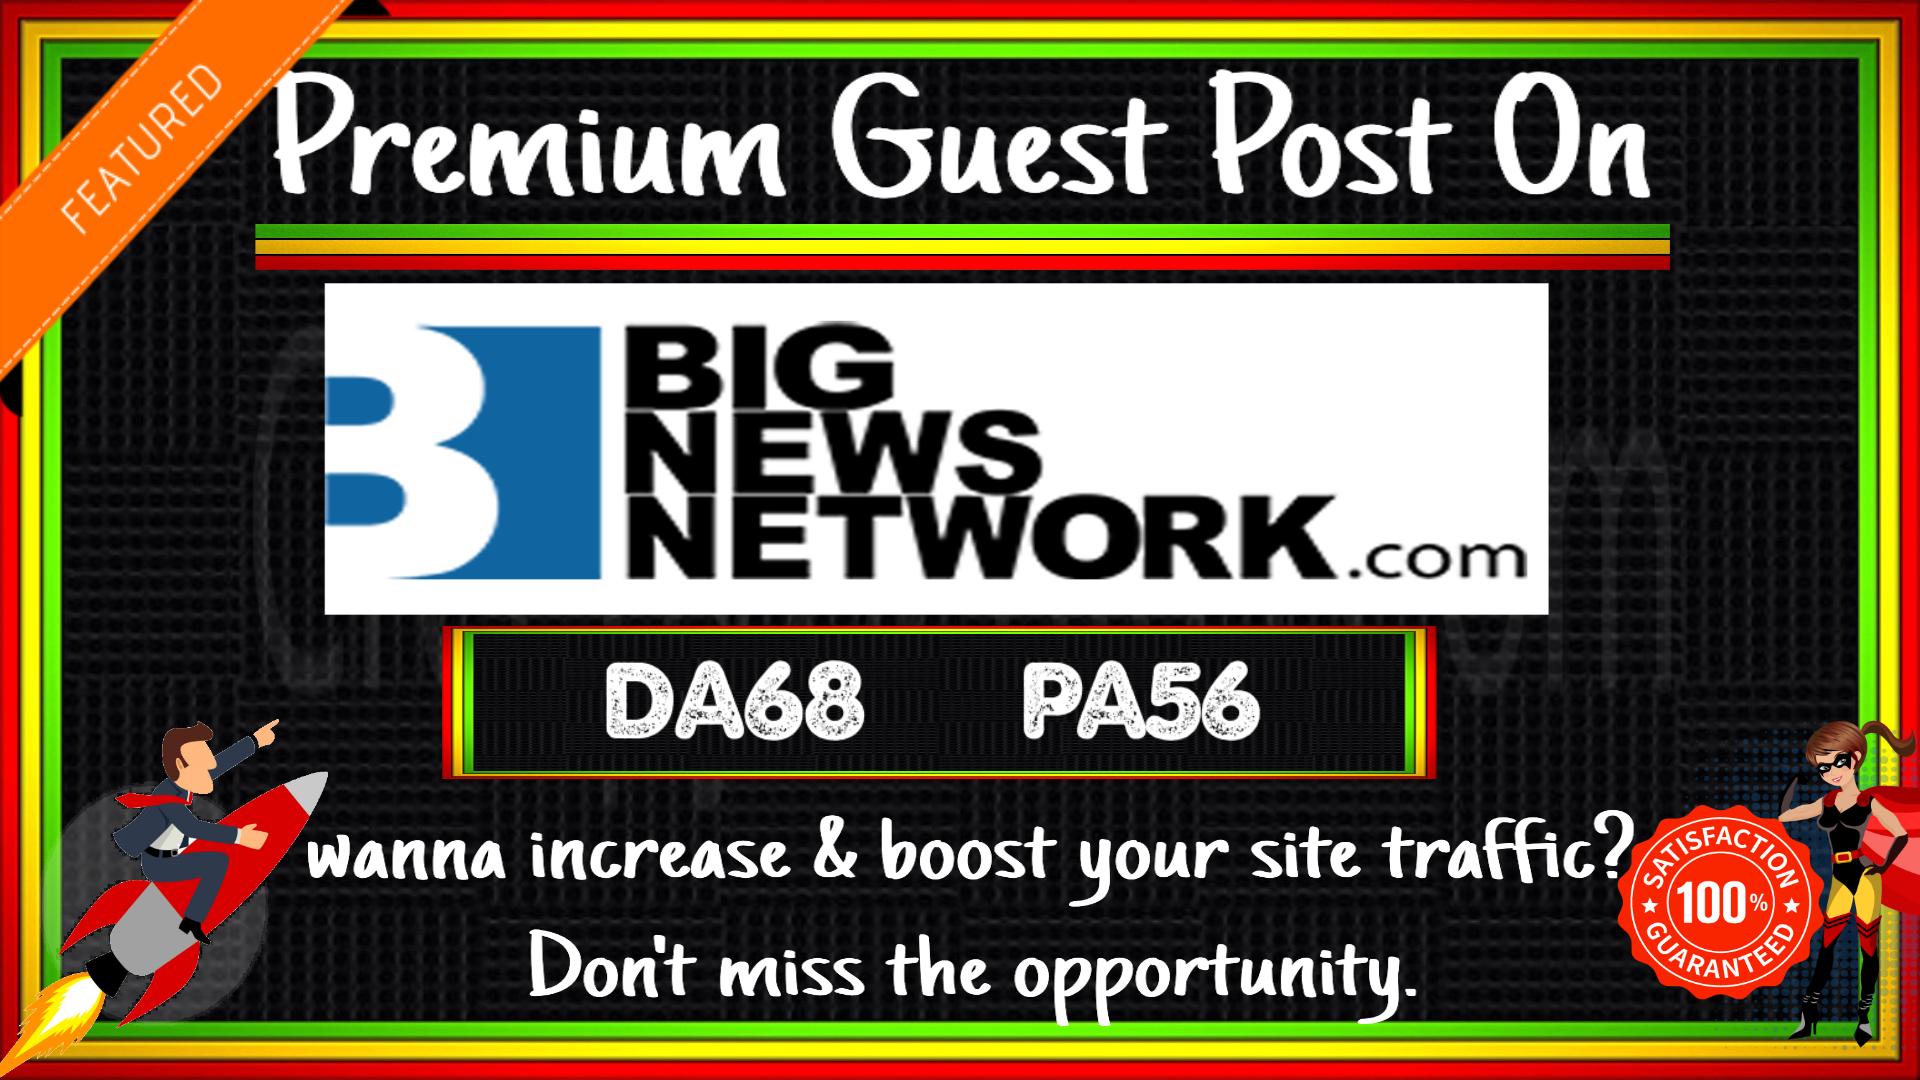 Write & Guest Post On Bignewsnetwork DA68 PA56